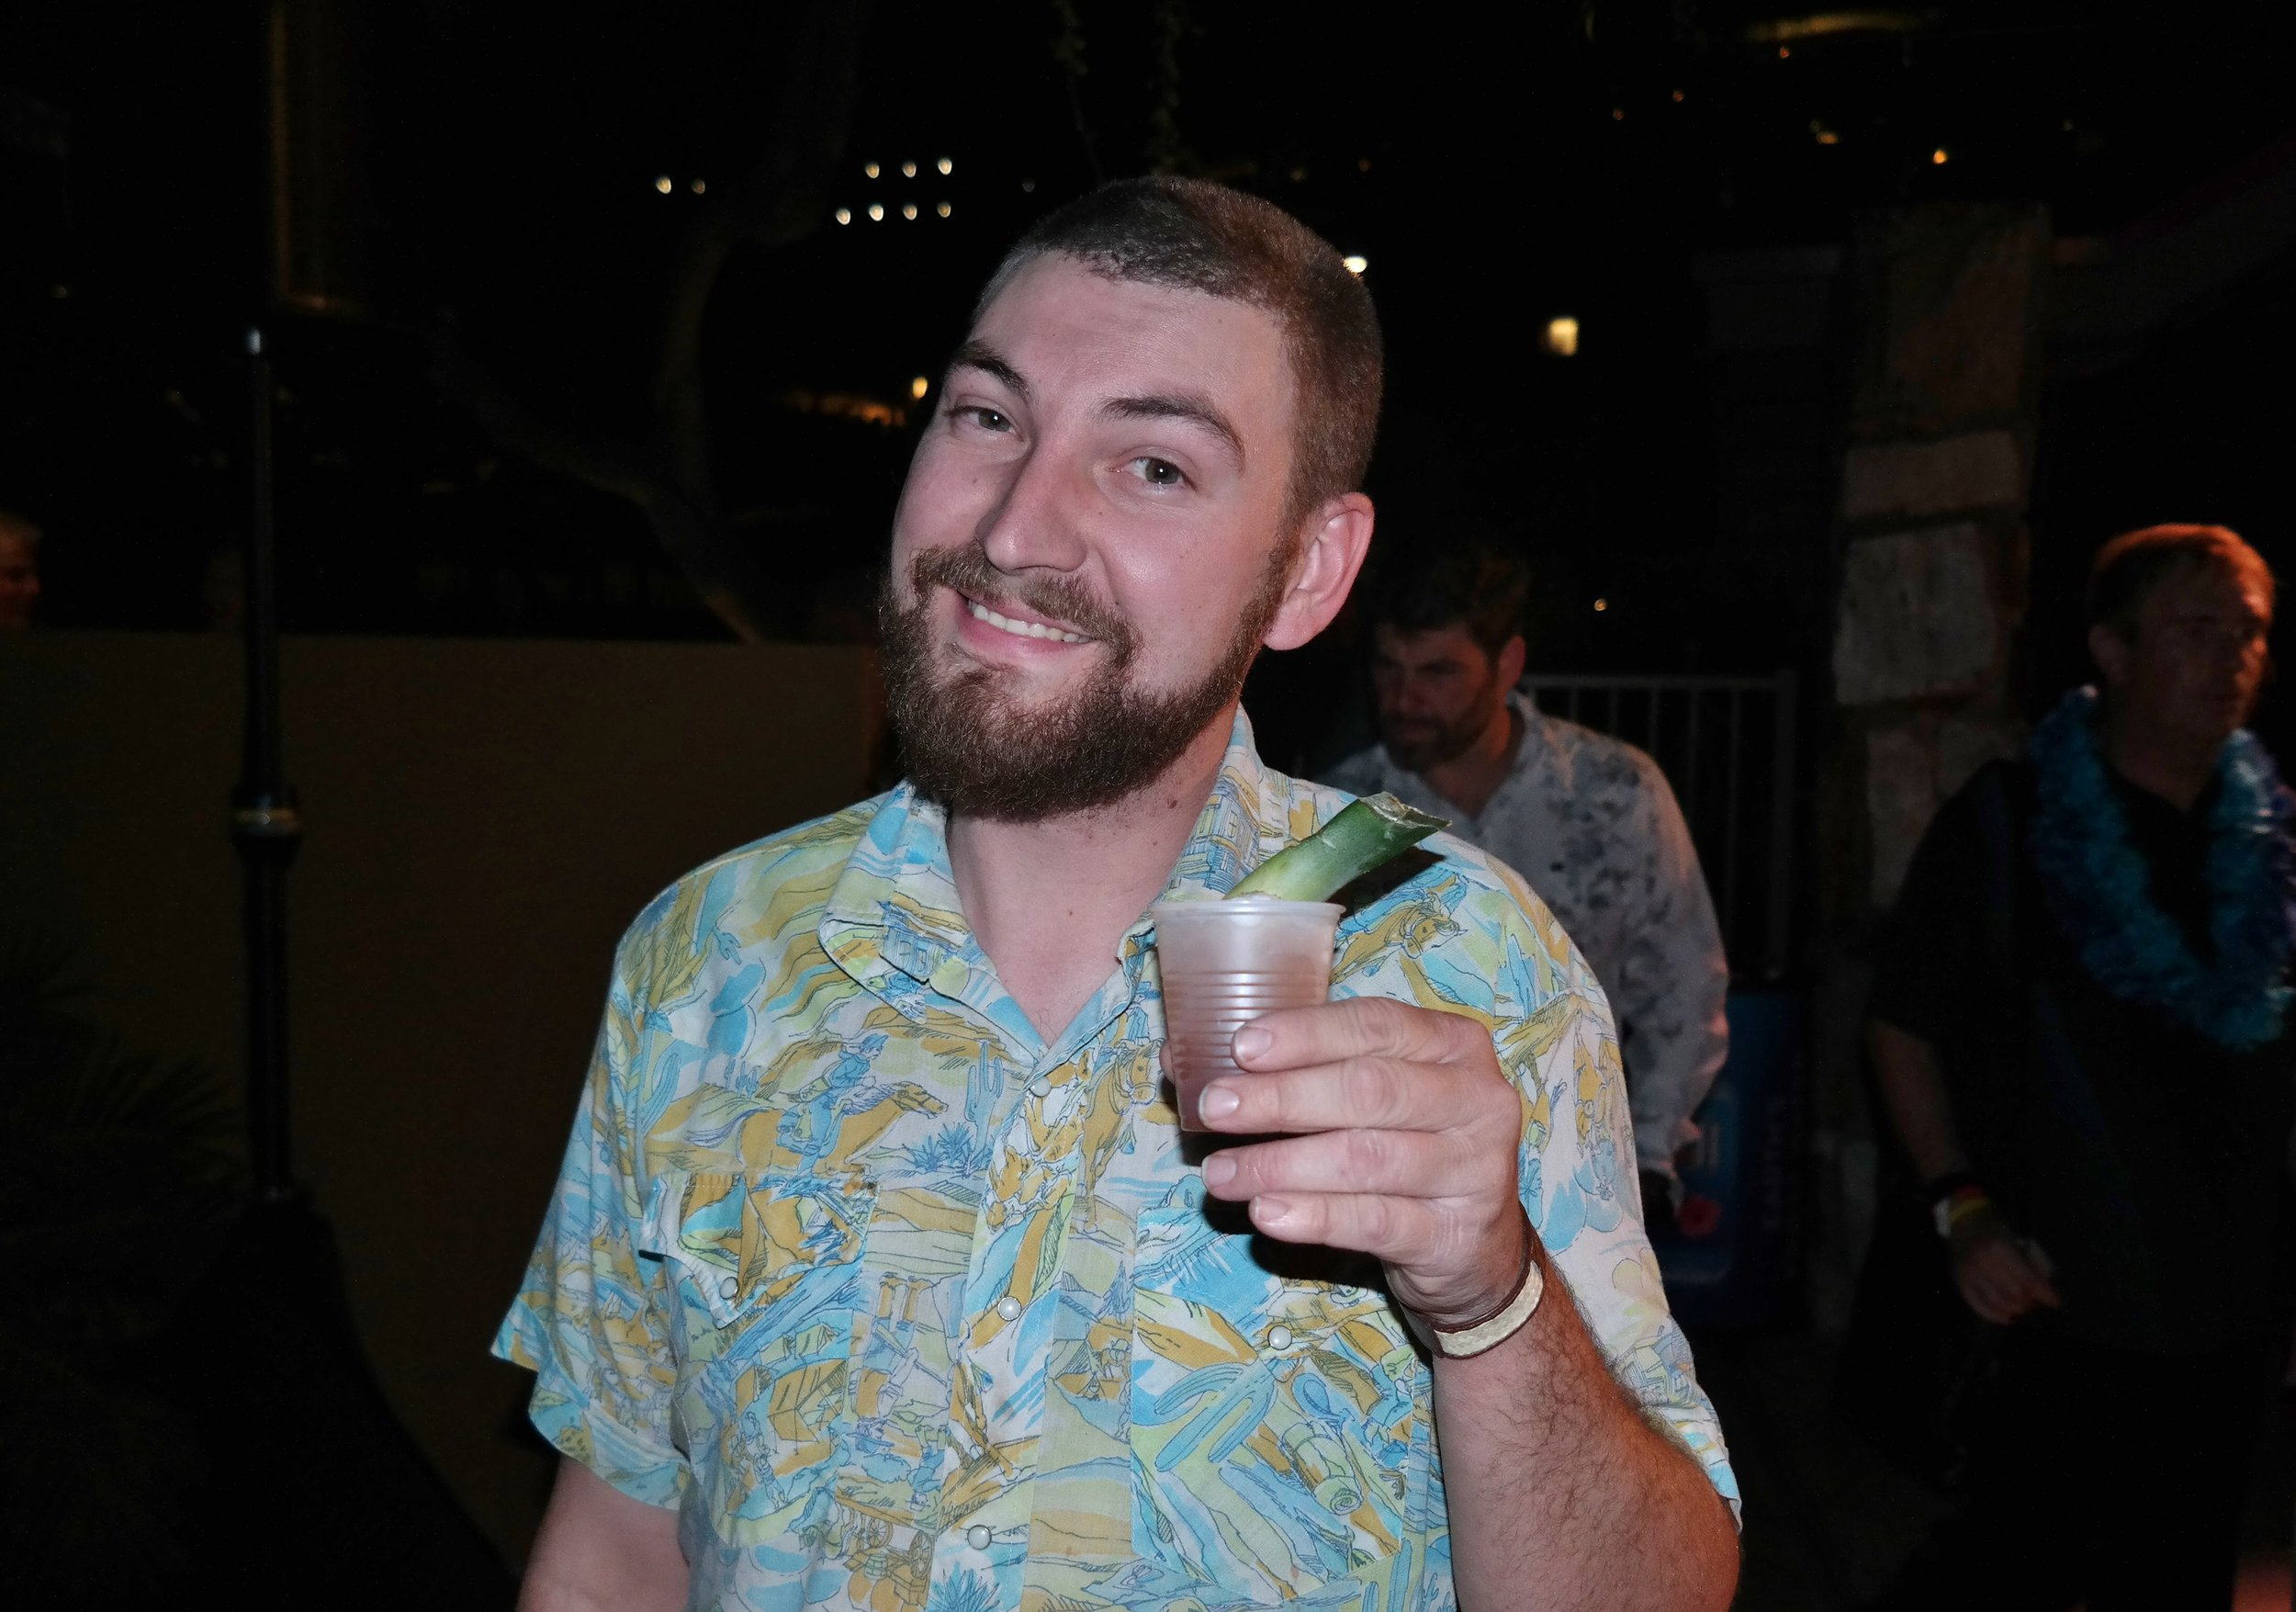 Michael Regan of the Mix-Up Bar at Royal Palms